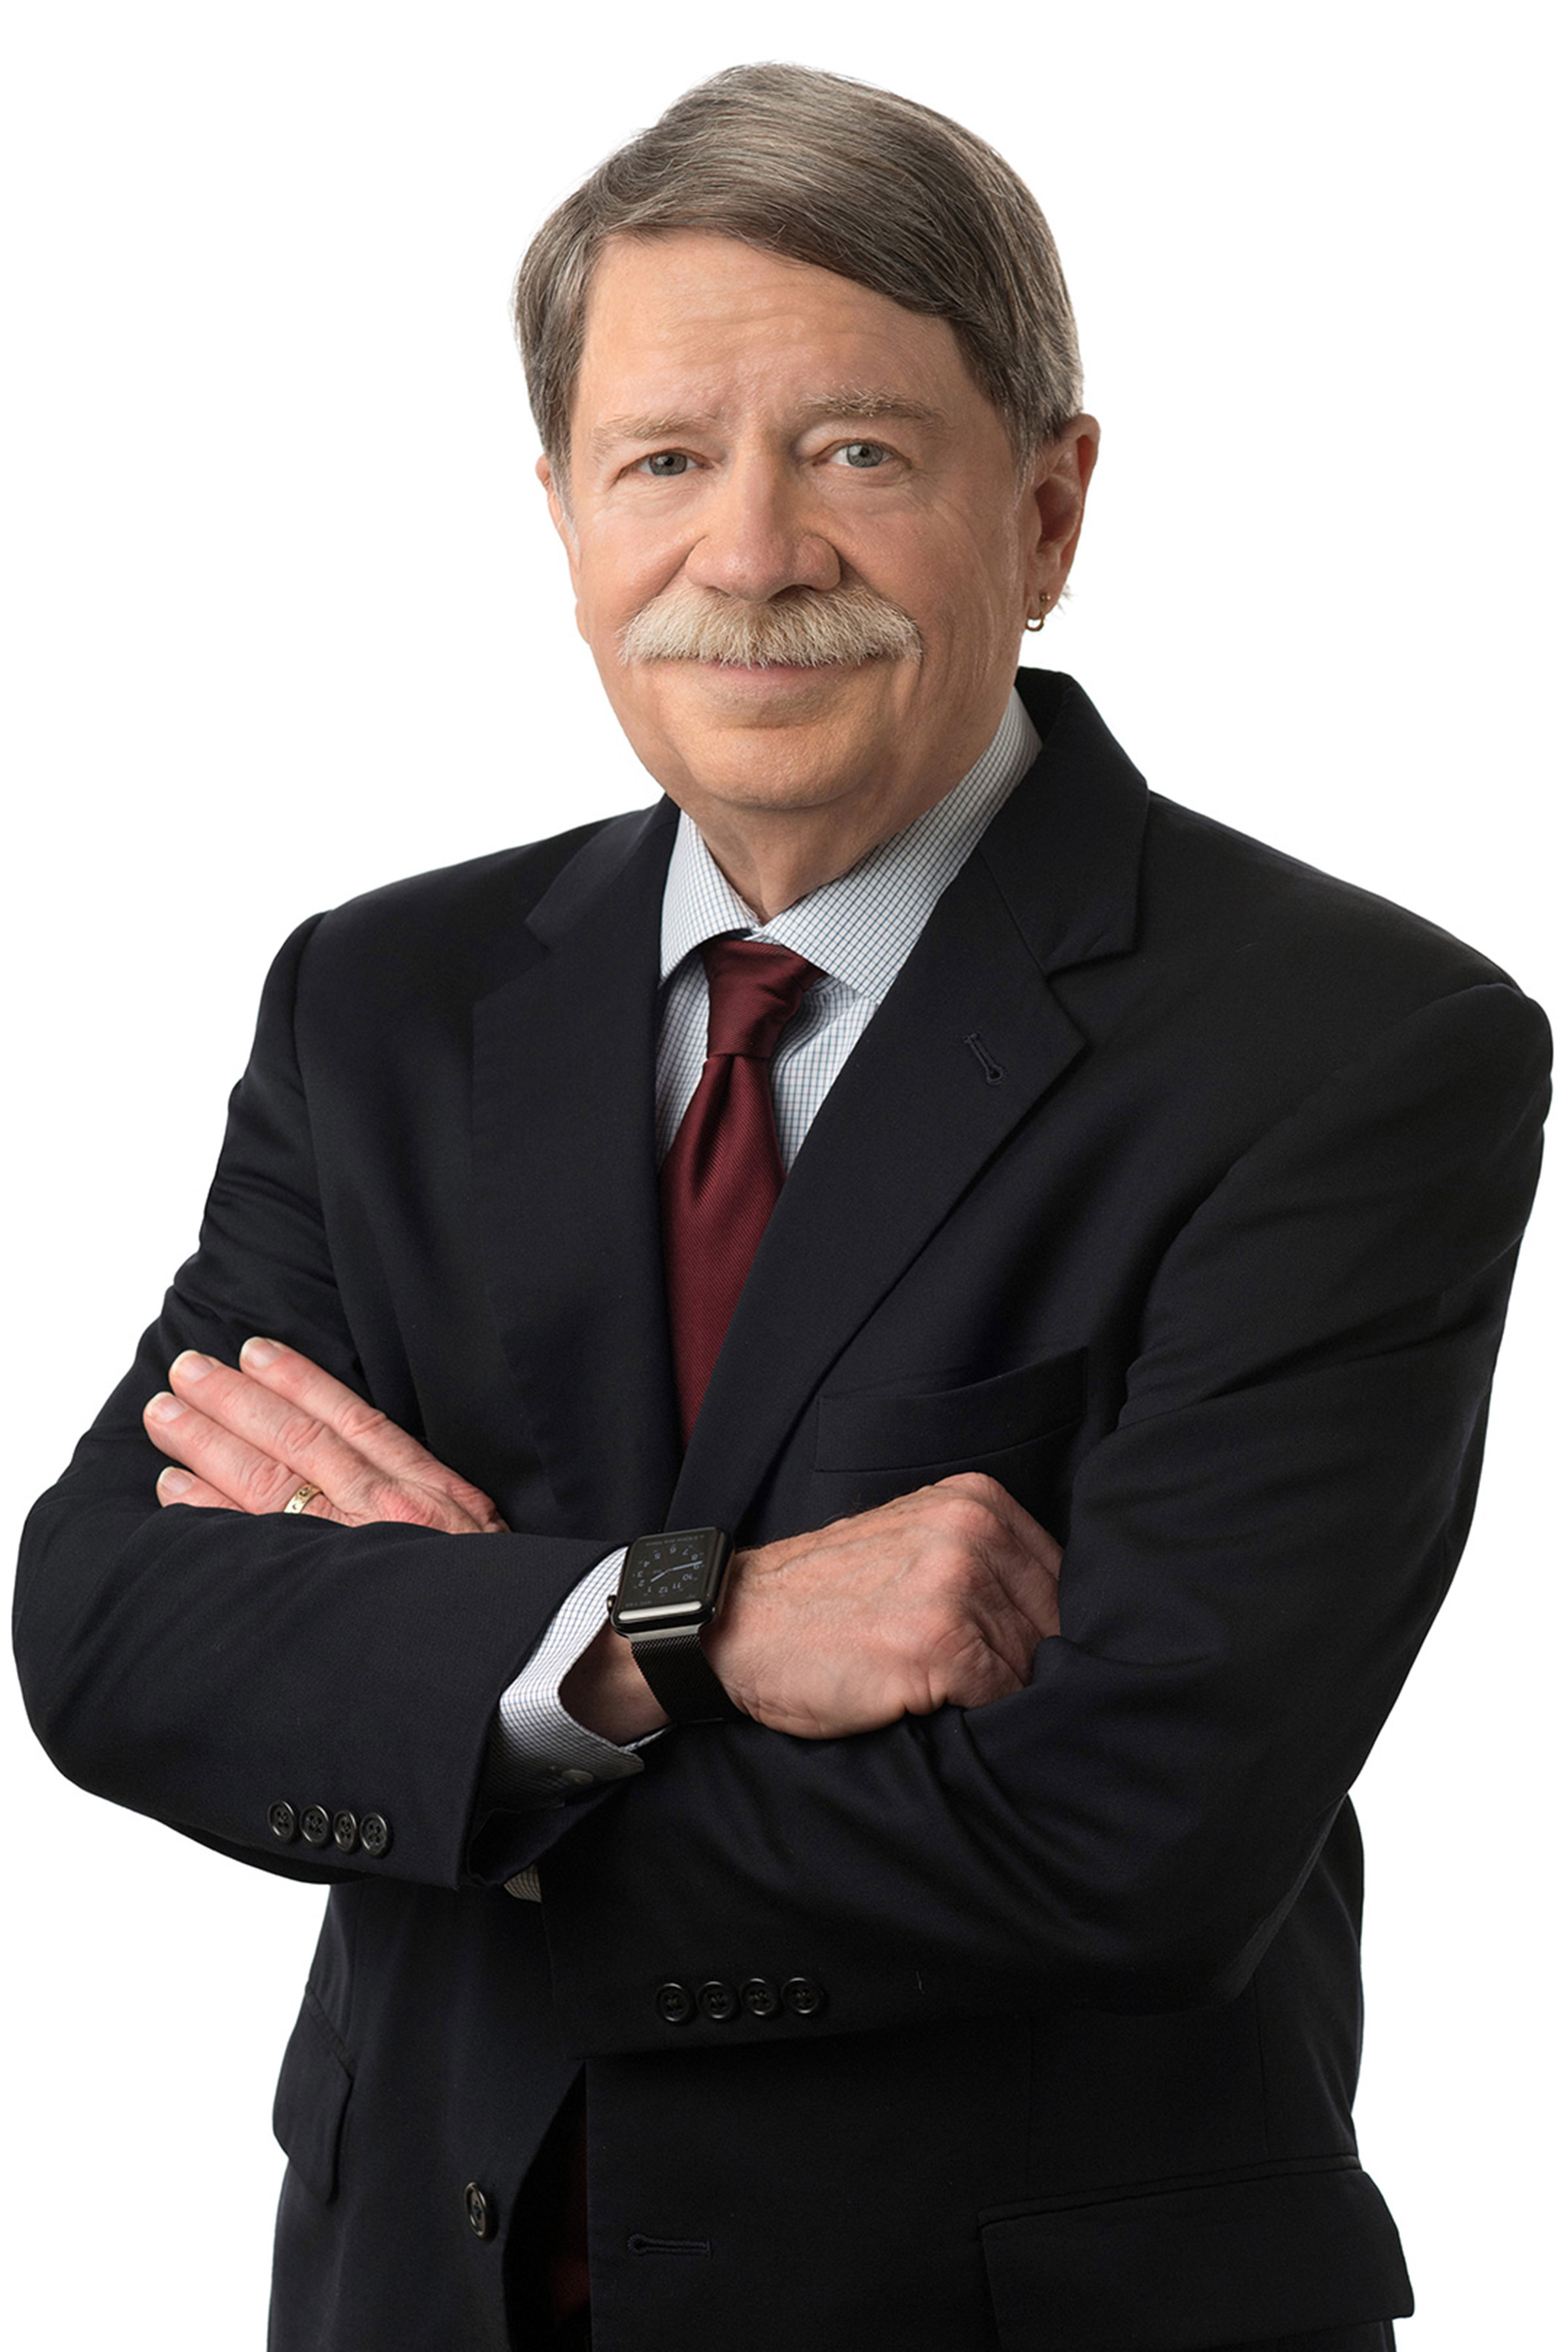 George B. Cauthen